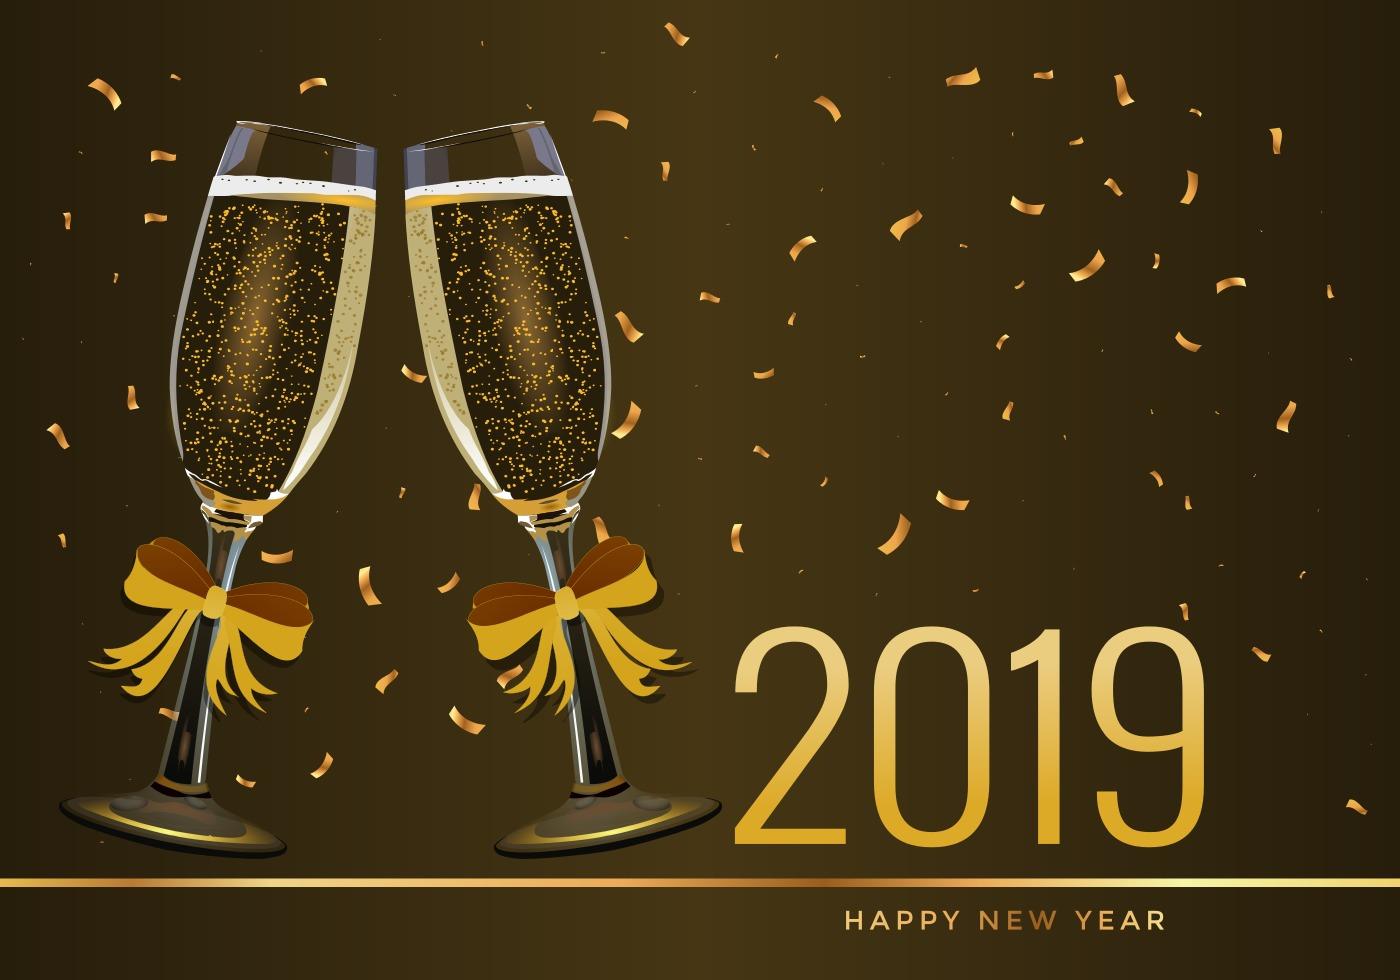 vector-new-year-2019-illustration.jpg